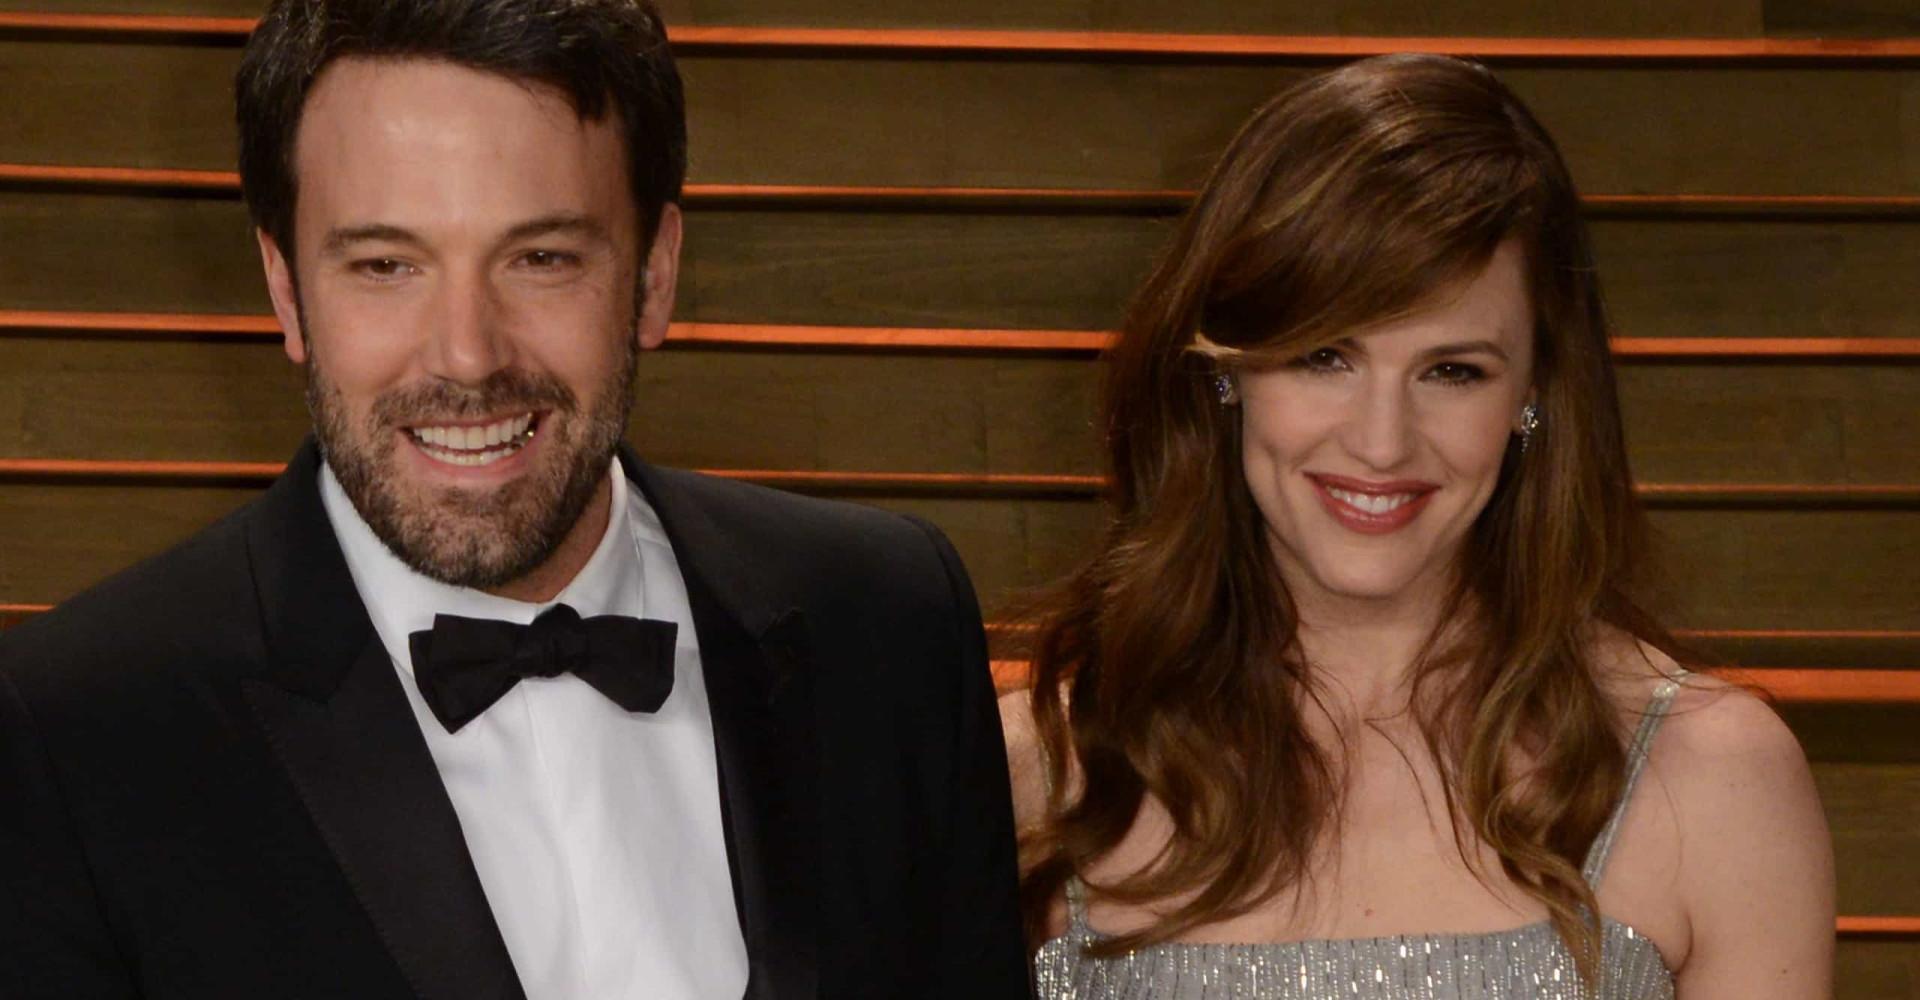 Celebrities reveal their biggest relationship regrets